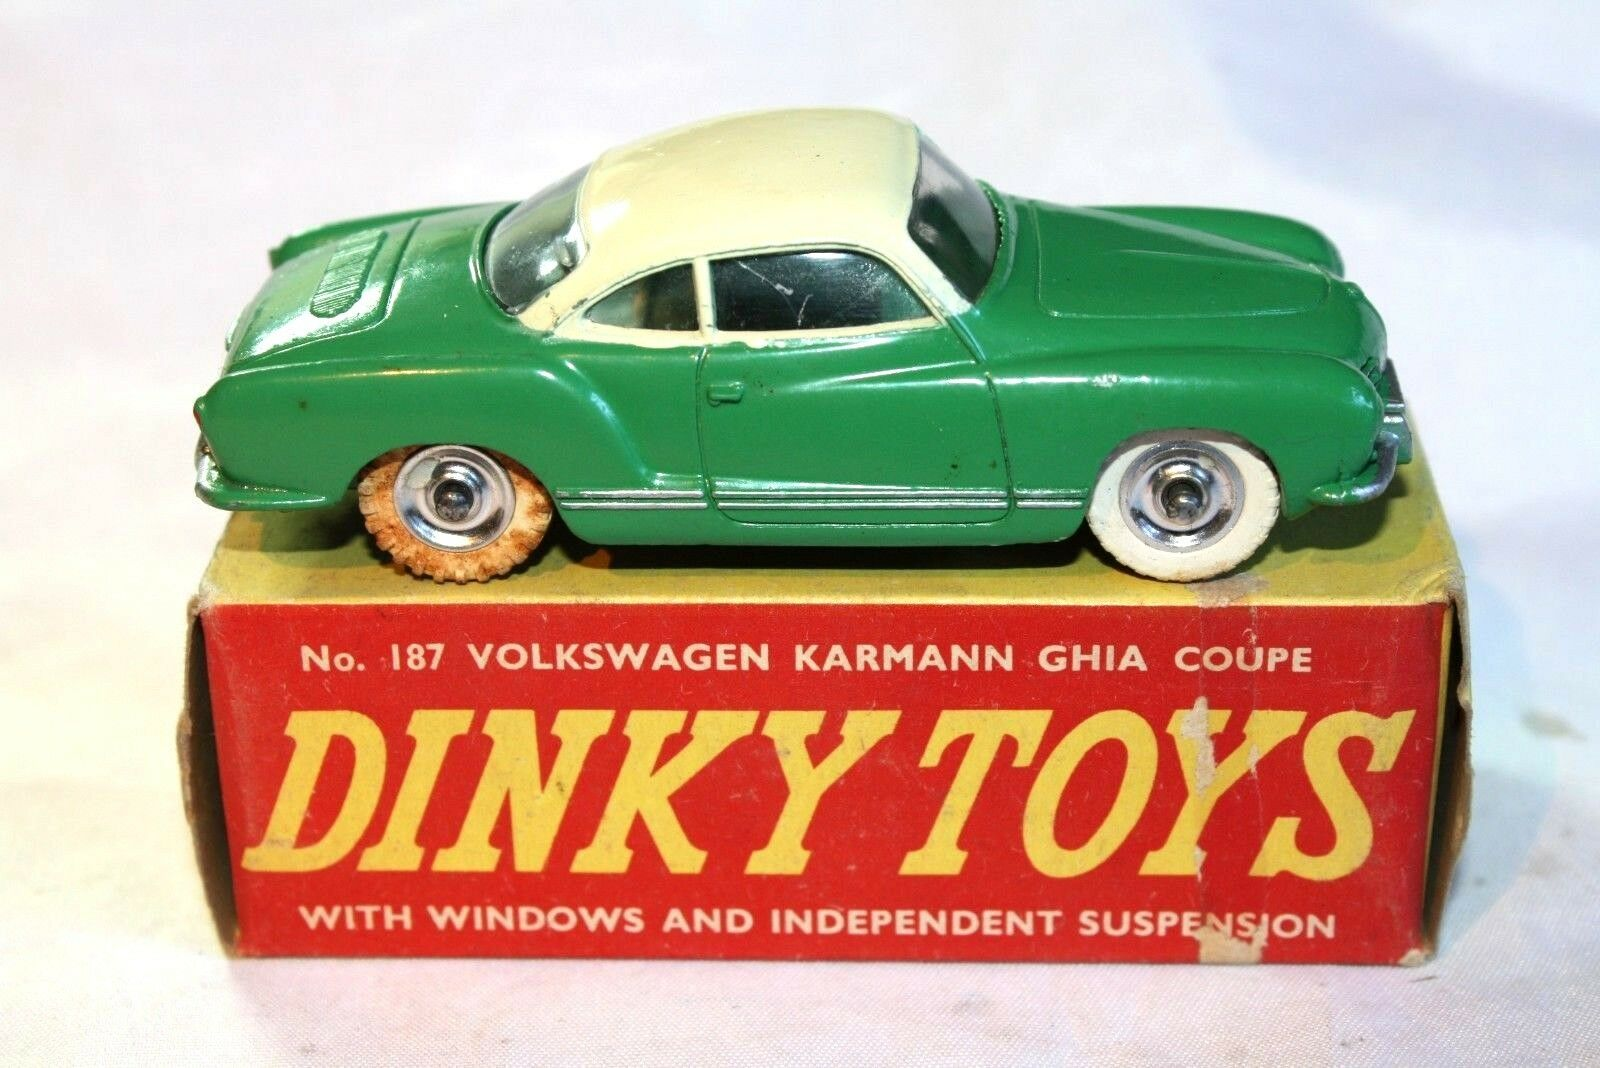 Niedlich   187 - volkswagen karmann ghia coupé, hervorragende originalverpackt